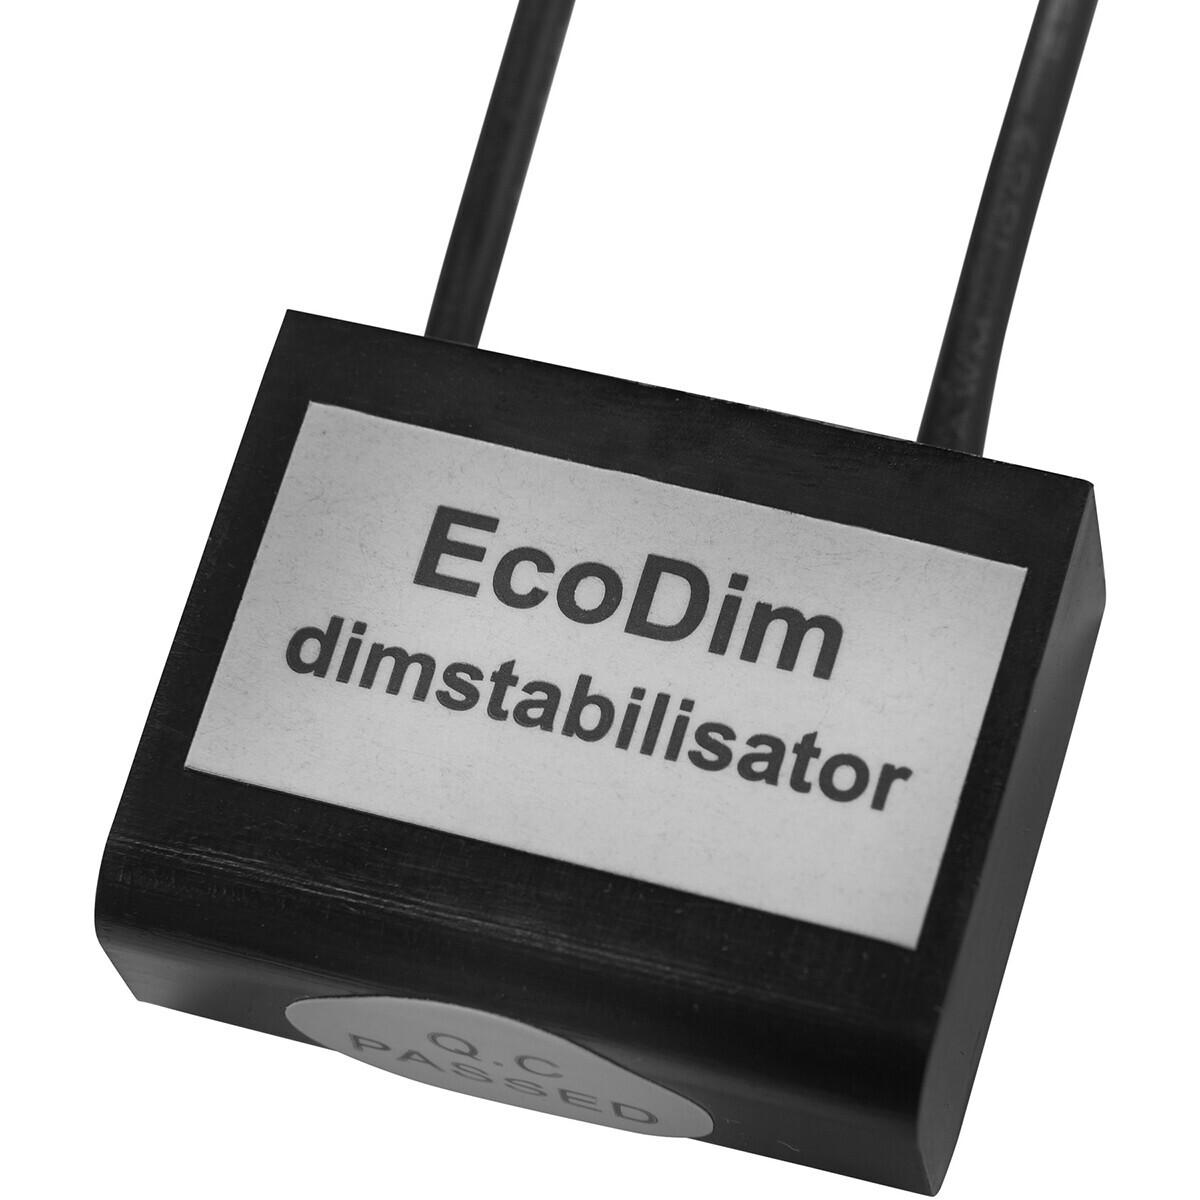 EcoDim - LED Dimstabilisator - ED-10009 - Universeel - Zwart